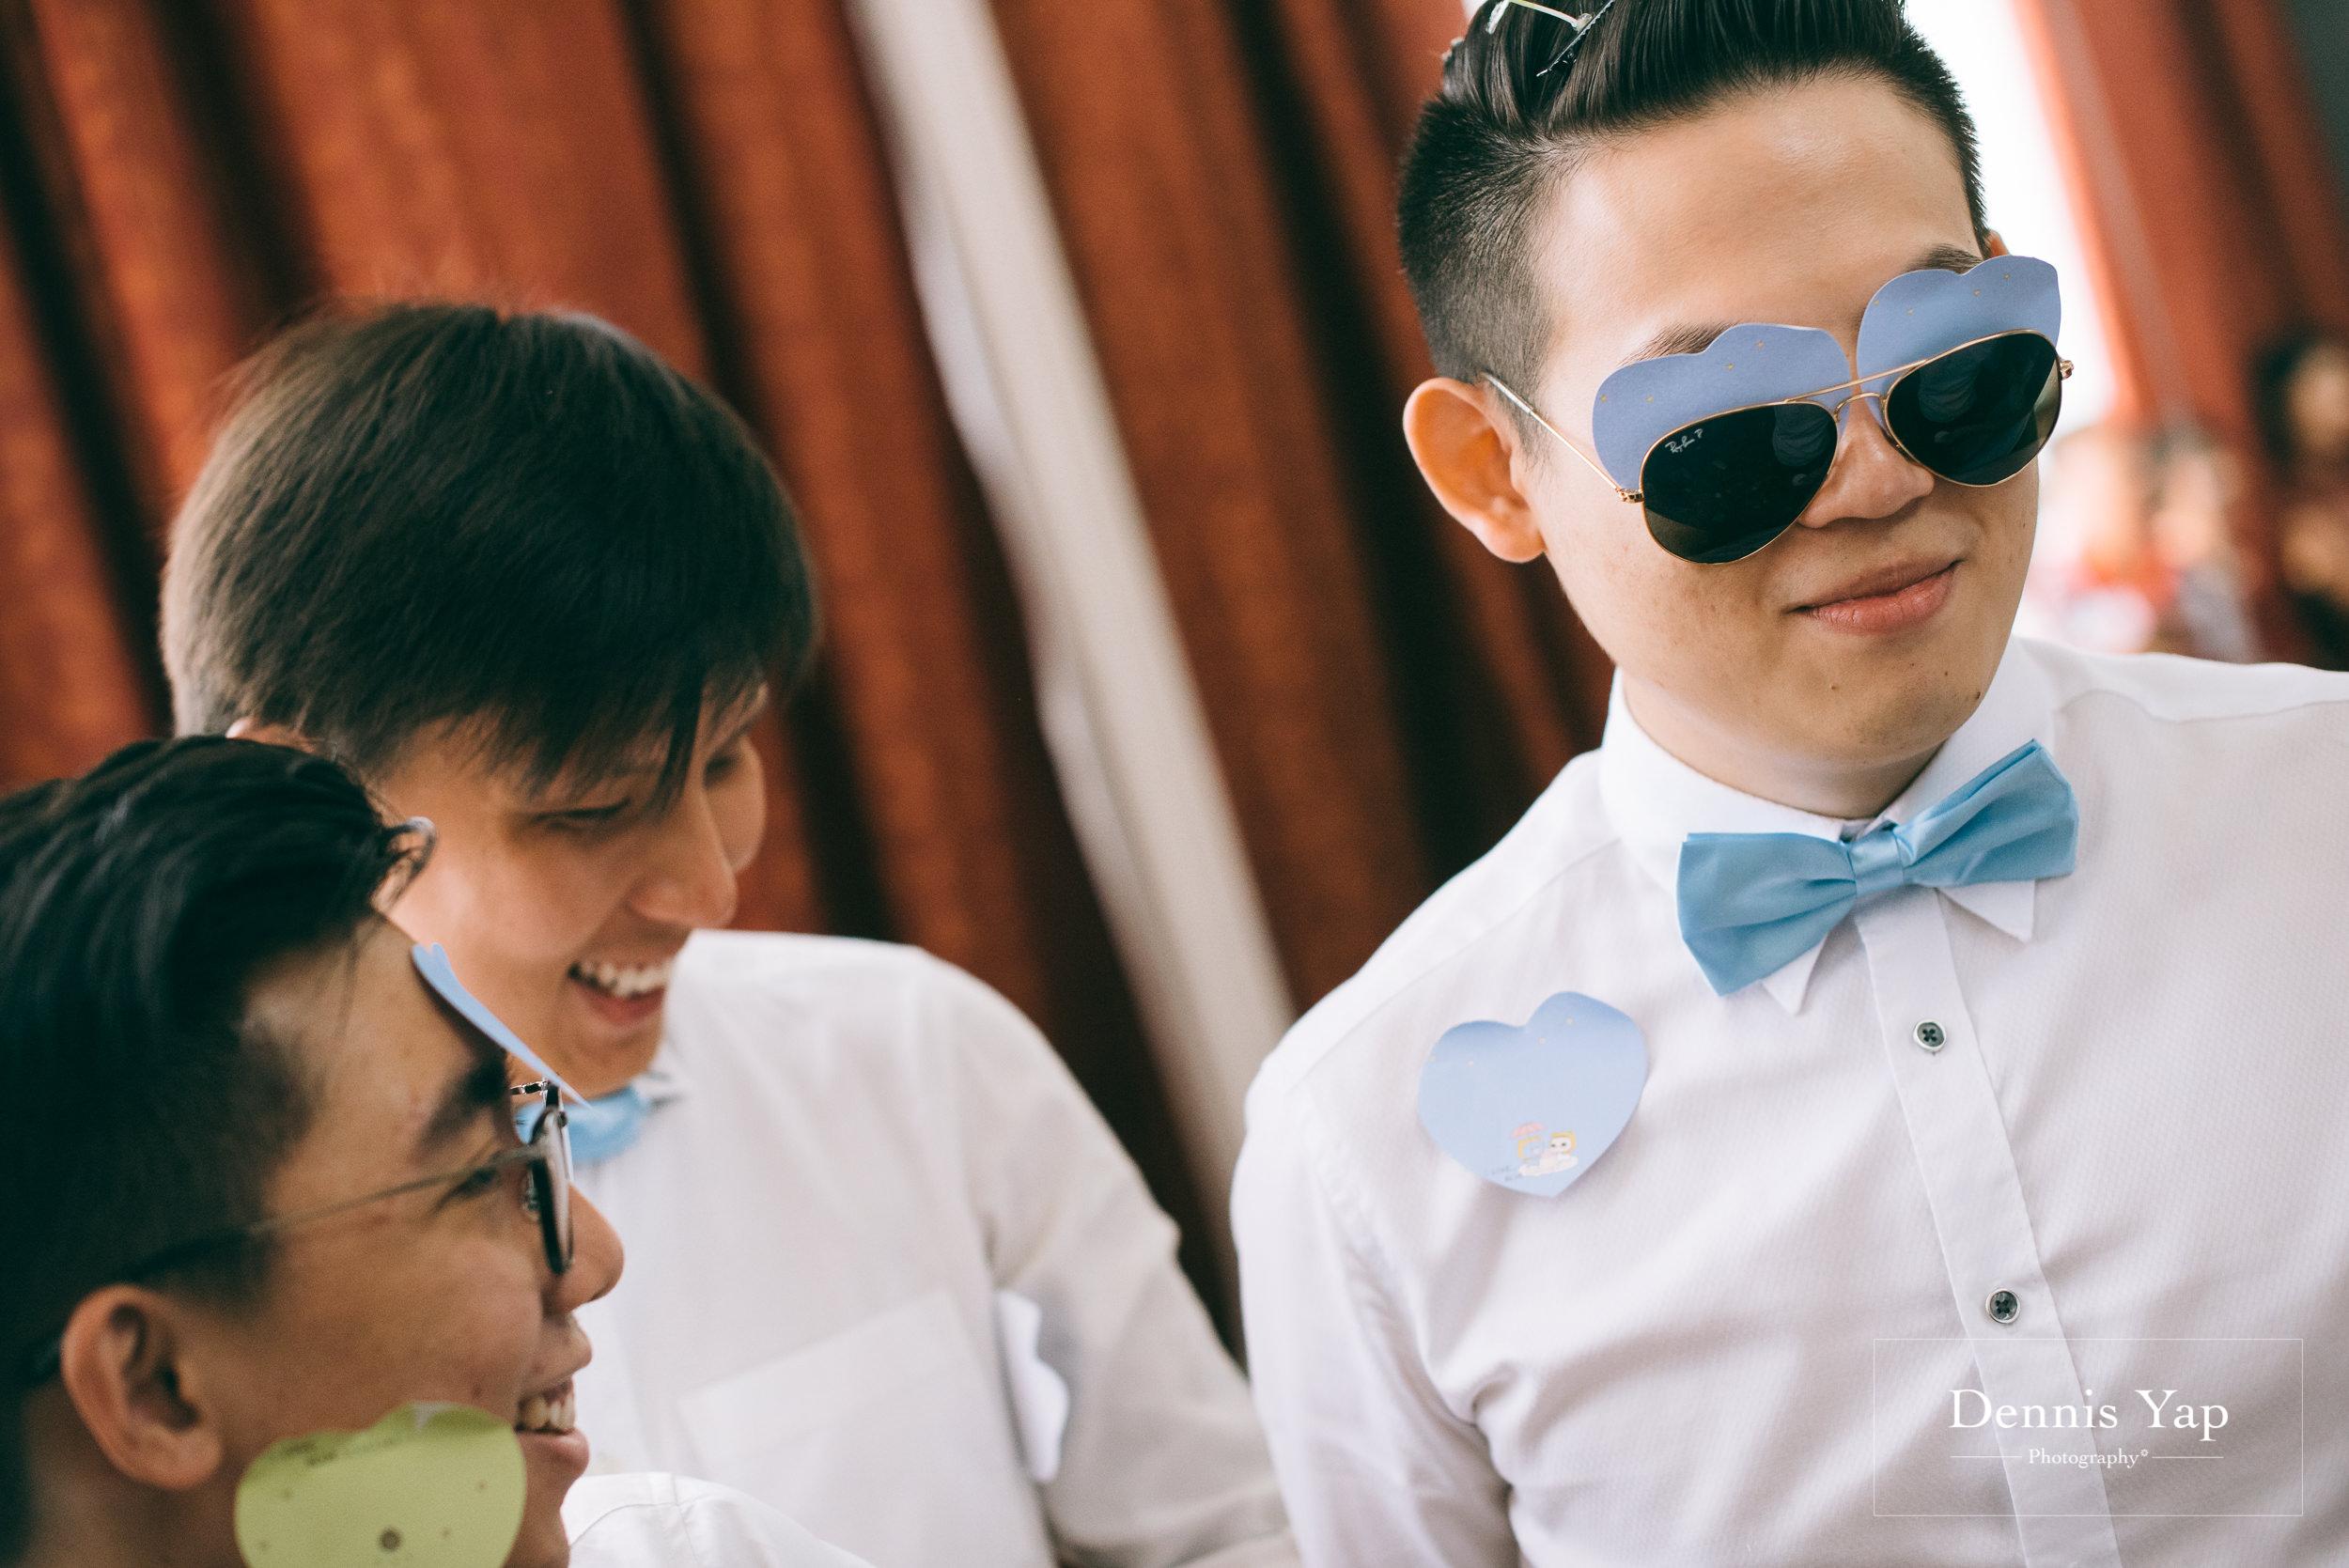 joon keat siew hui wedding day dennis yap malaysia wedding photographer-14.jpg